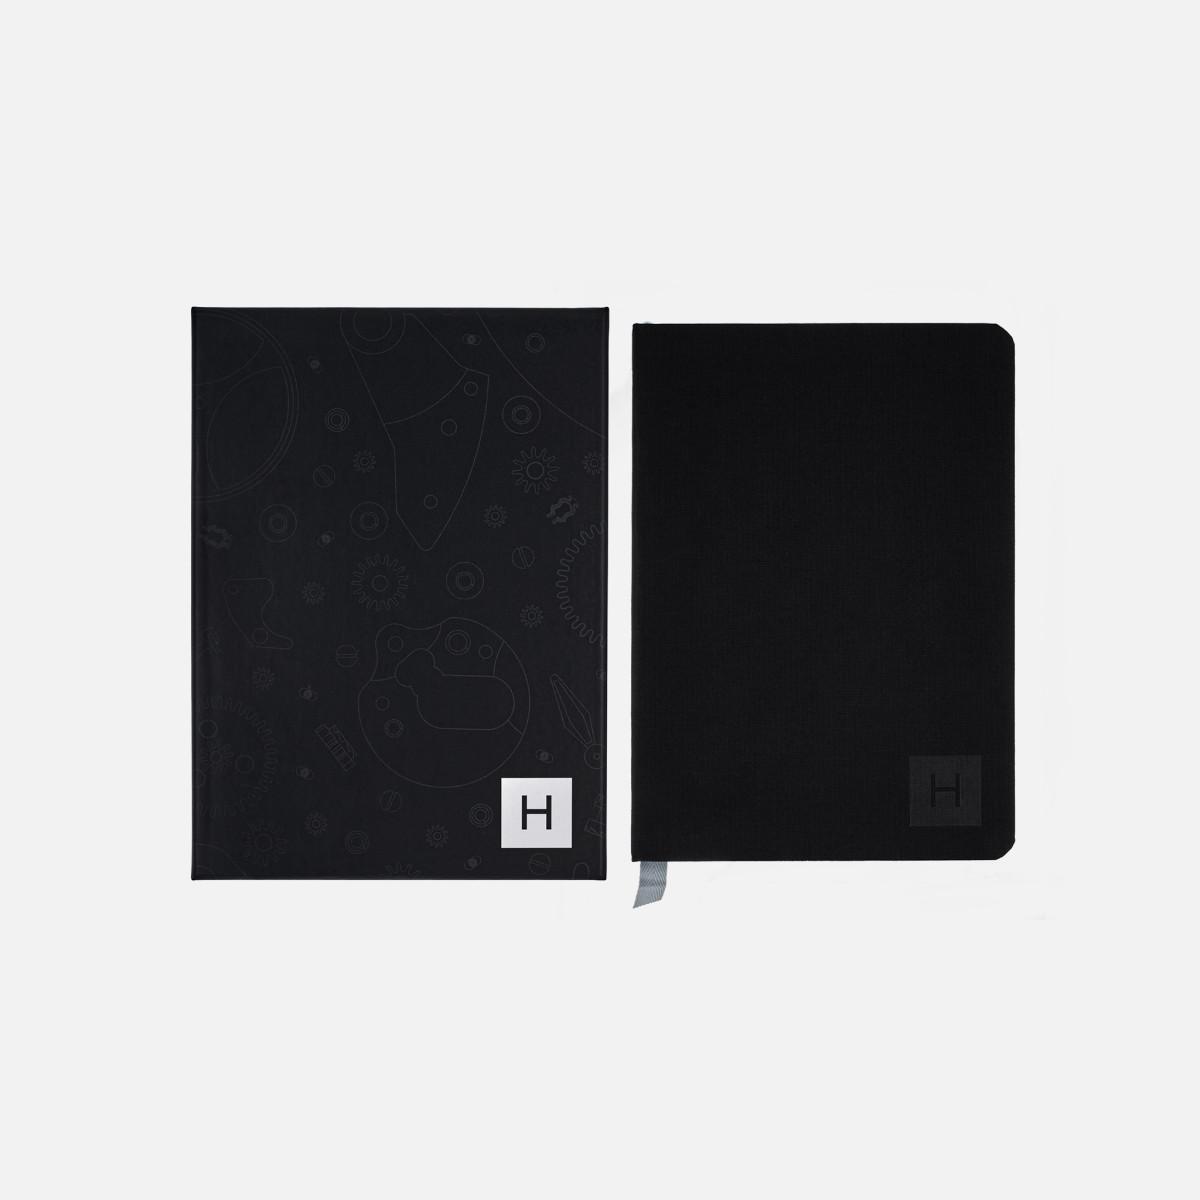 Hodinkee Notebook Flat